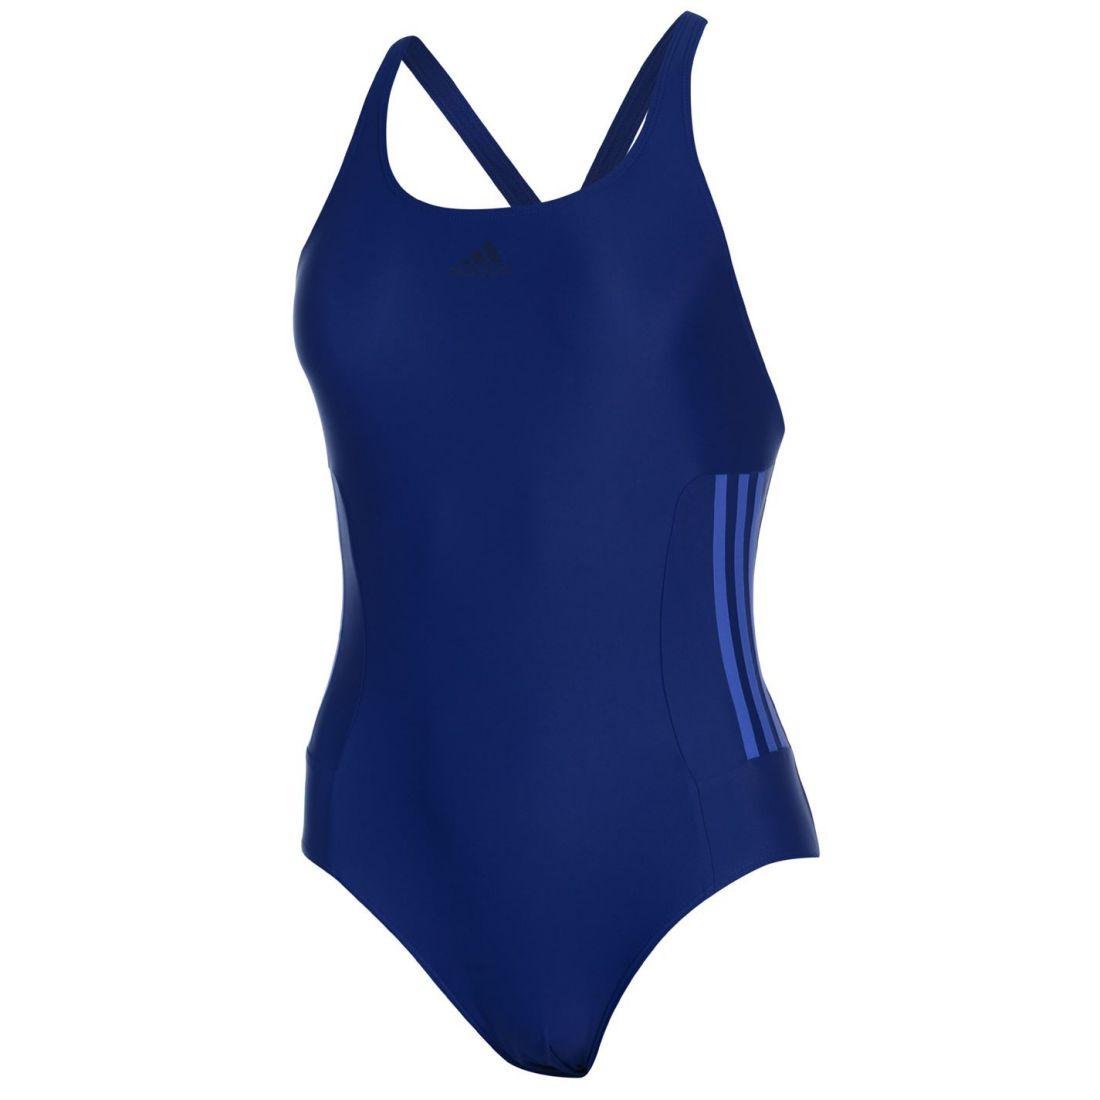 83c02cd911 adidas Womens Infinitex Fitness Eco Swimsuit Stripe Chlorine ...